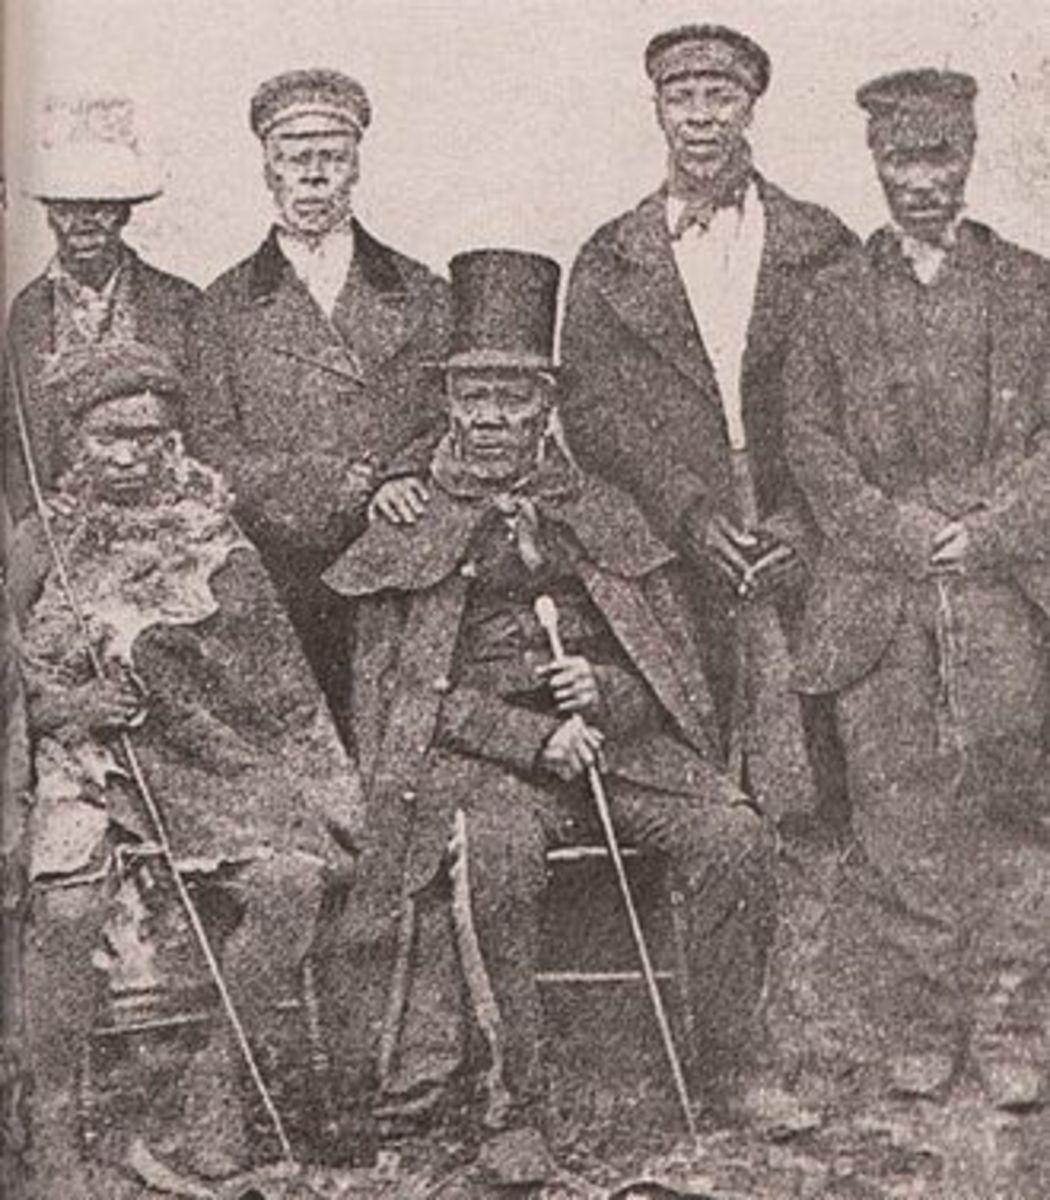 King Moshoeshoe (Moshesh) 18